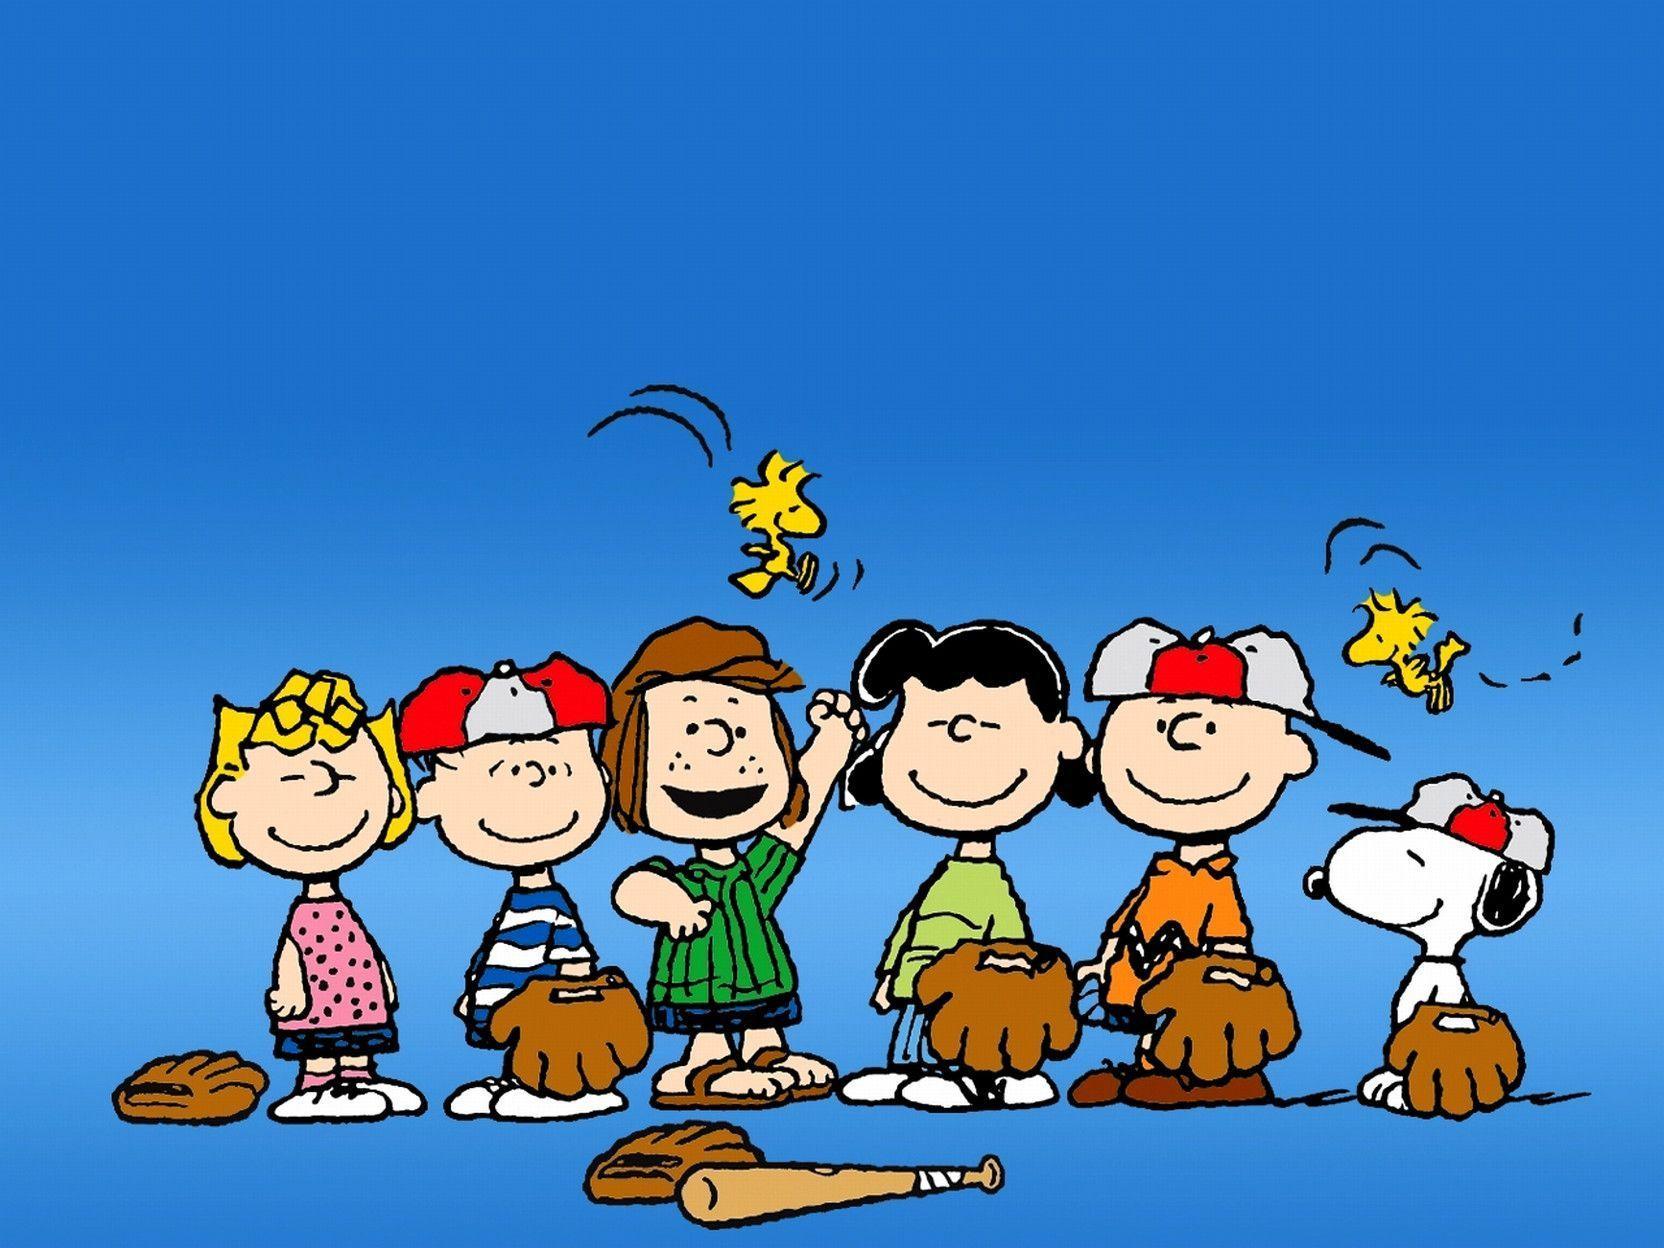 Peanuts Snoopy Wallpaper For Desktop HD Wallpapers 1664